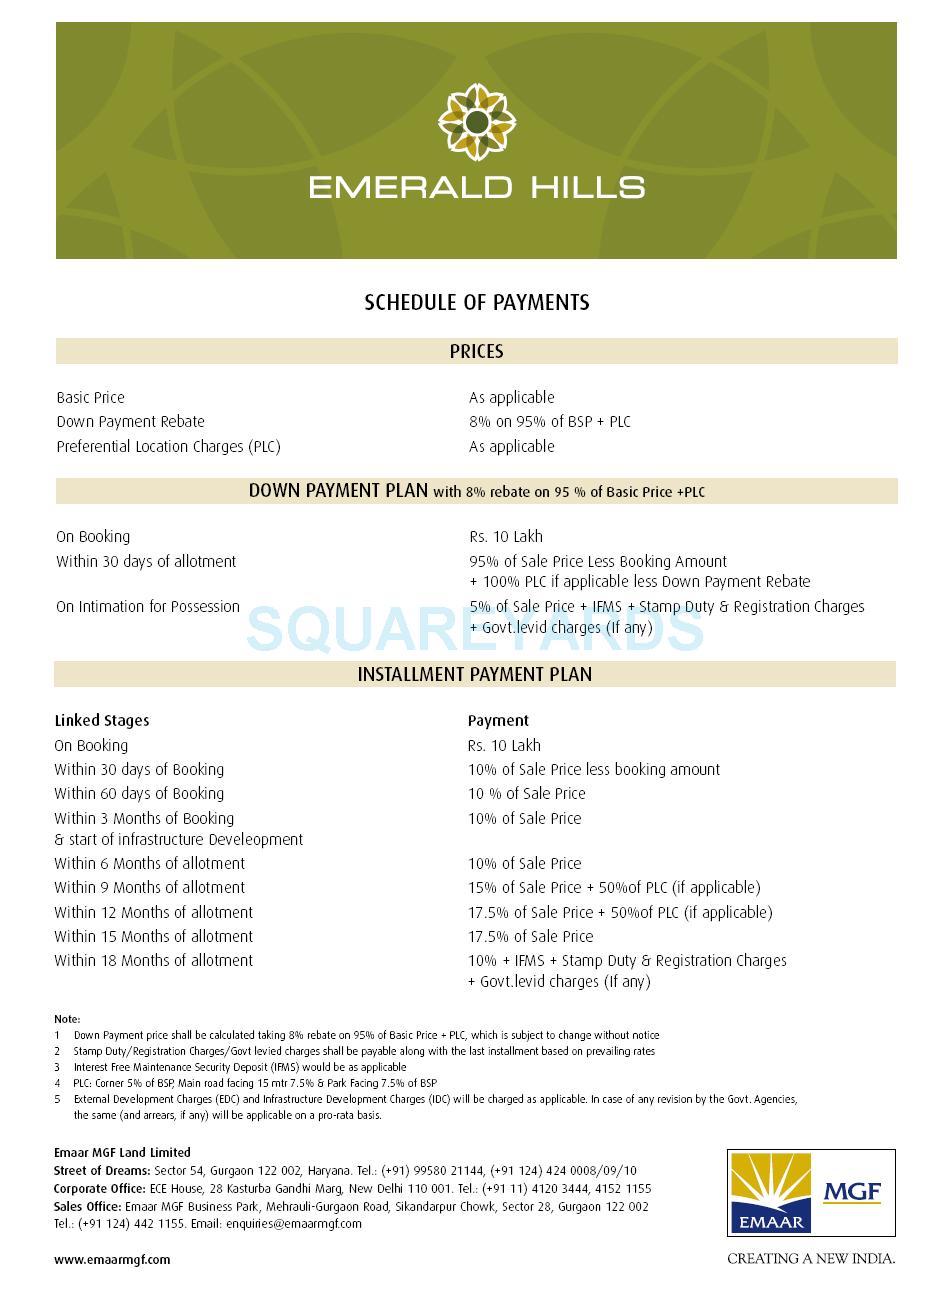 emaar mgf emerald floors payment plan image1